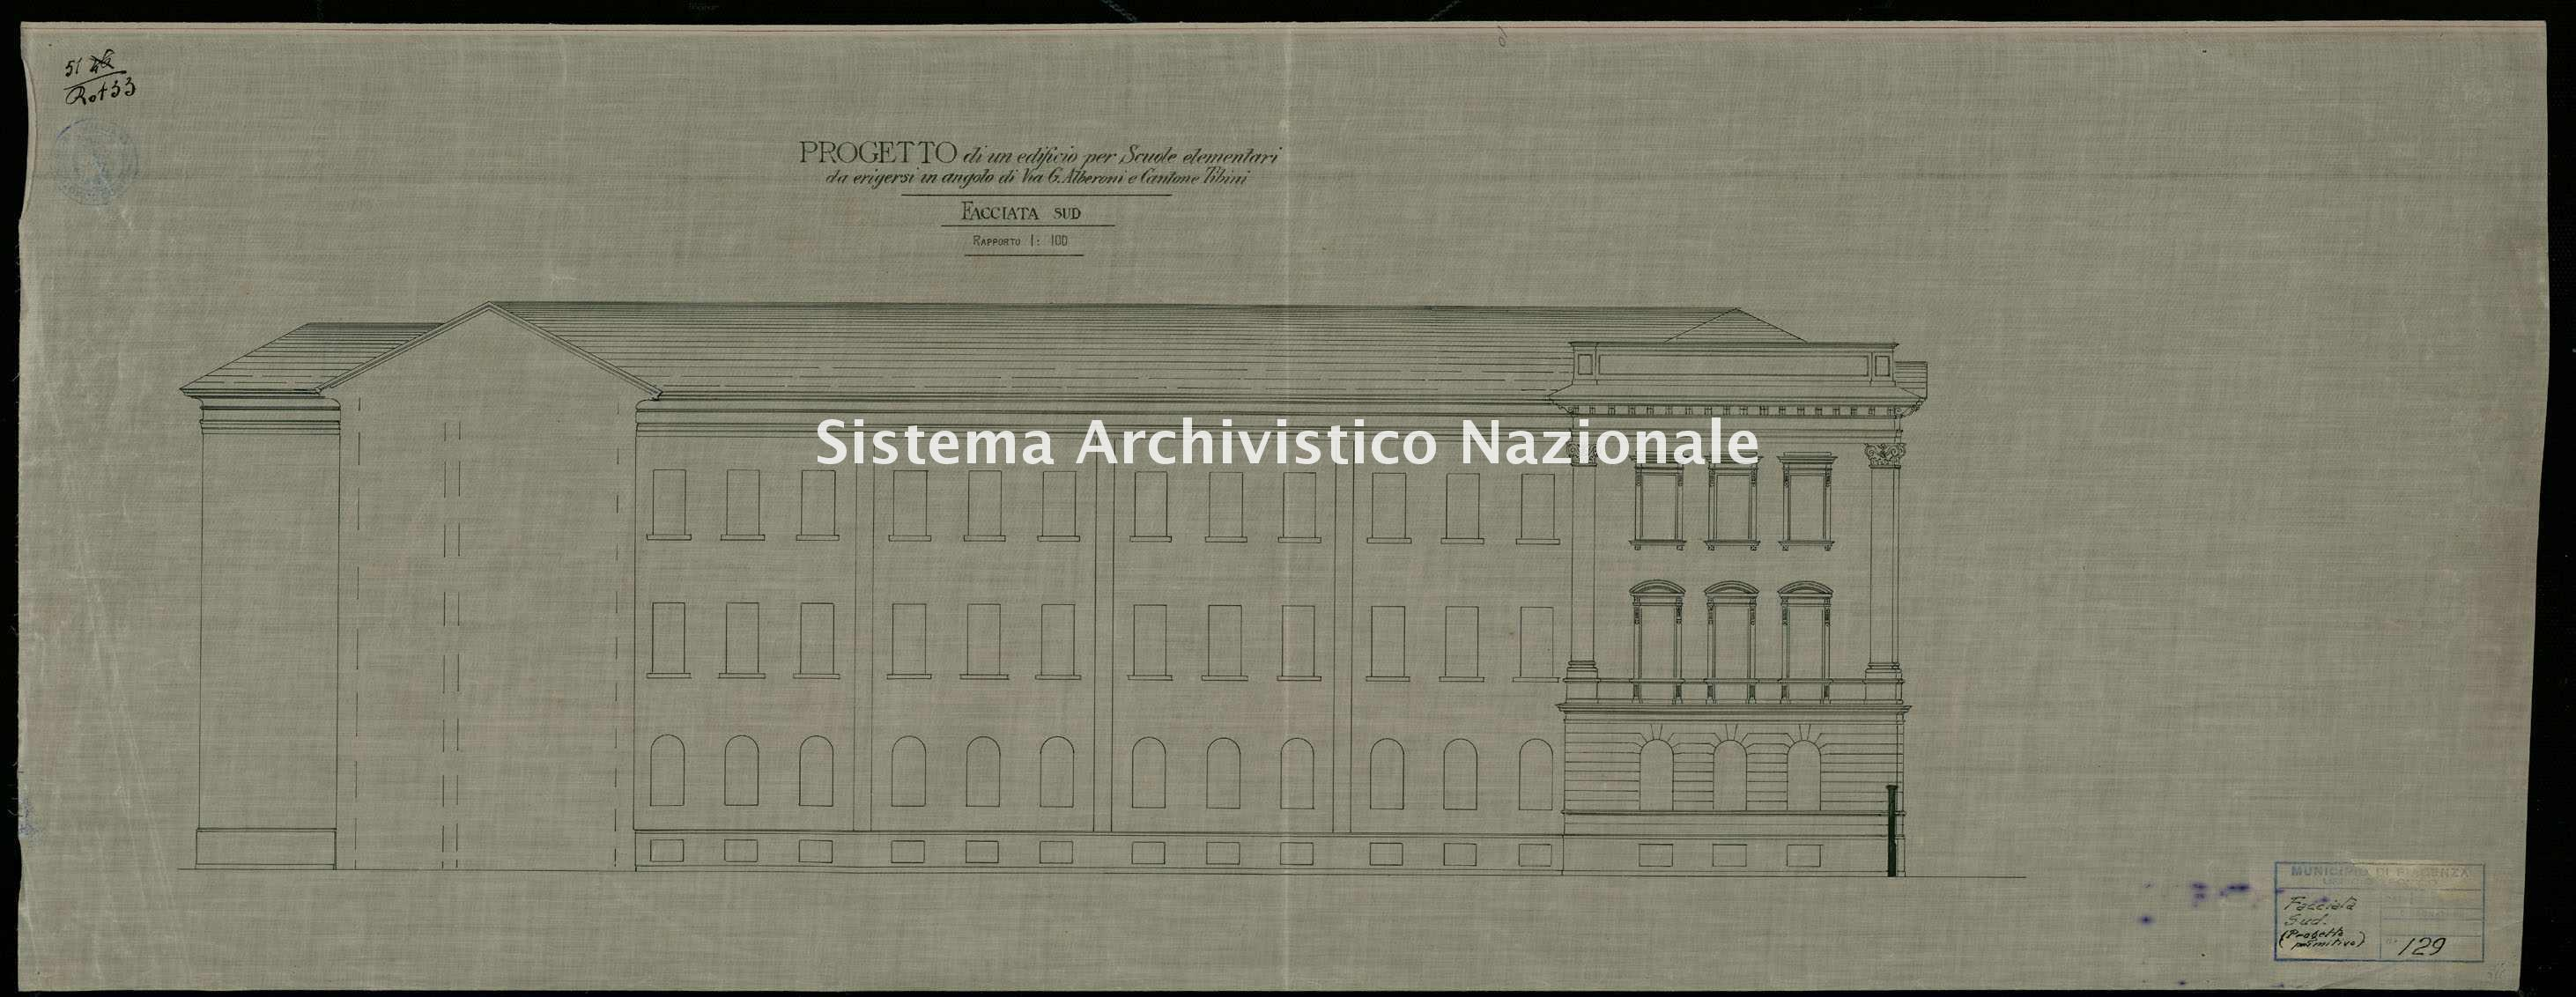 ASPC Mappe, stampe e disegni, n. 5171